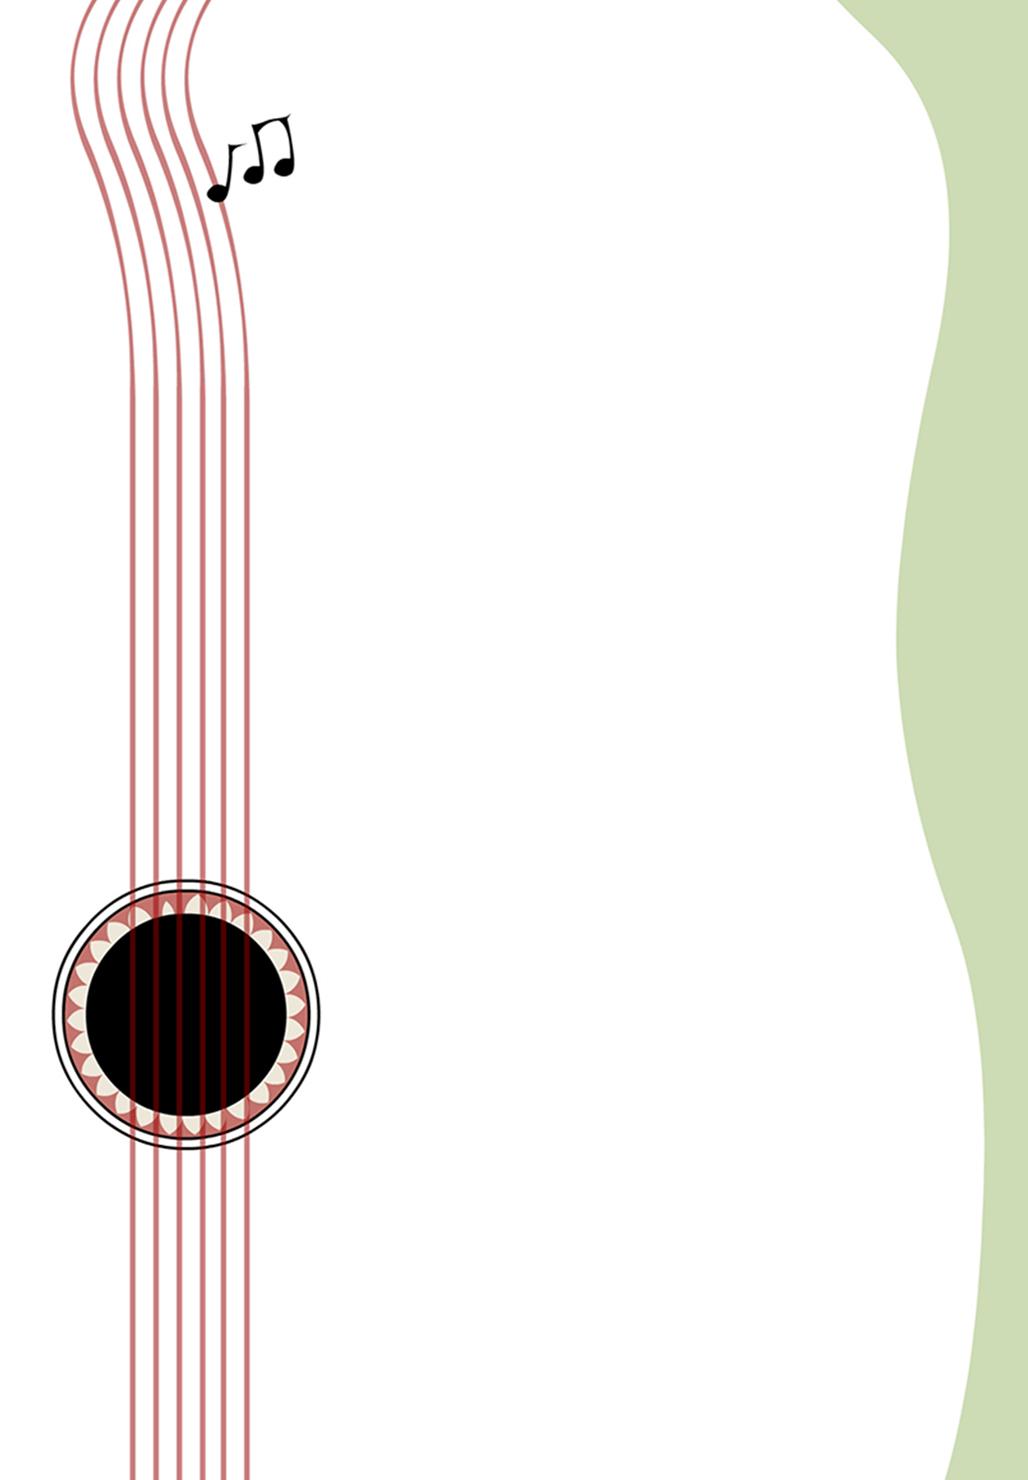 free invitation template a guitar melody greetings island rh pinterest com